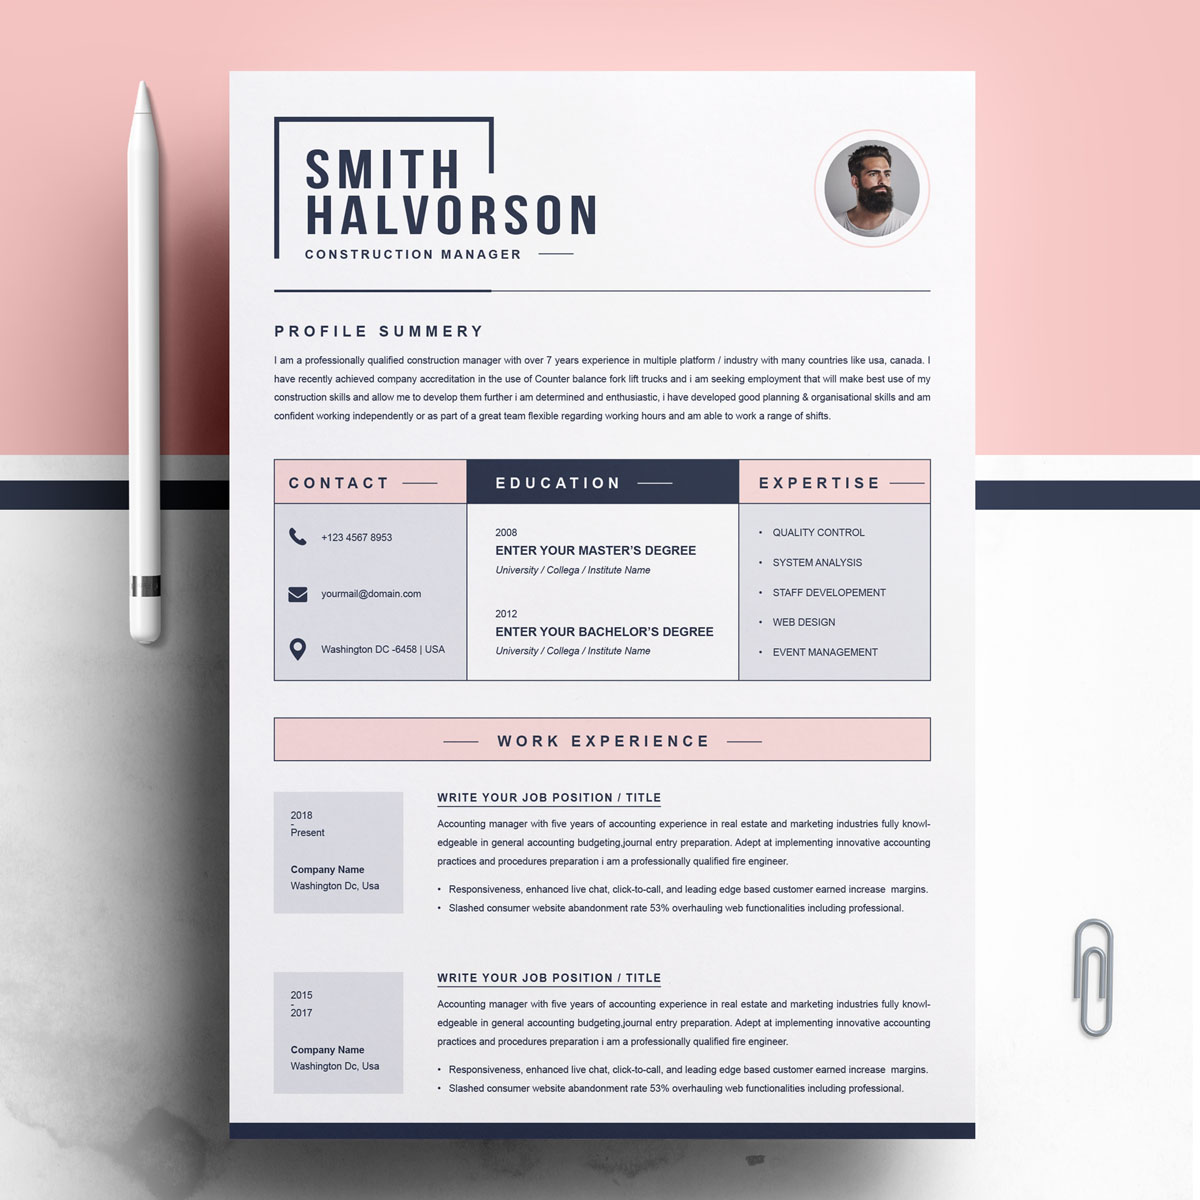 Smith Halvorson Resume Template